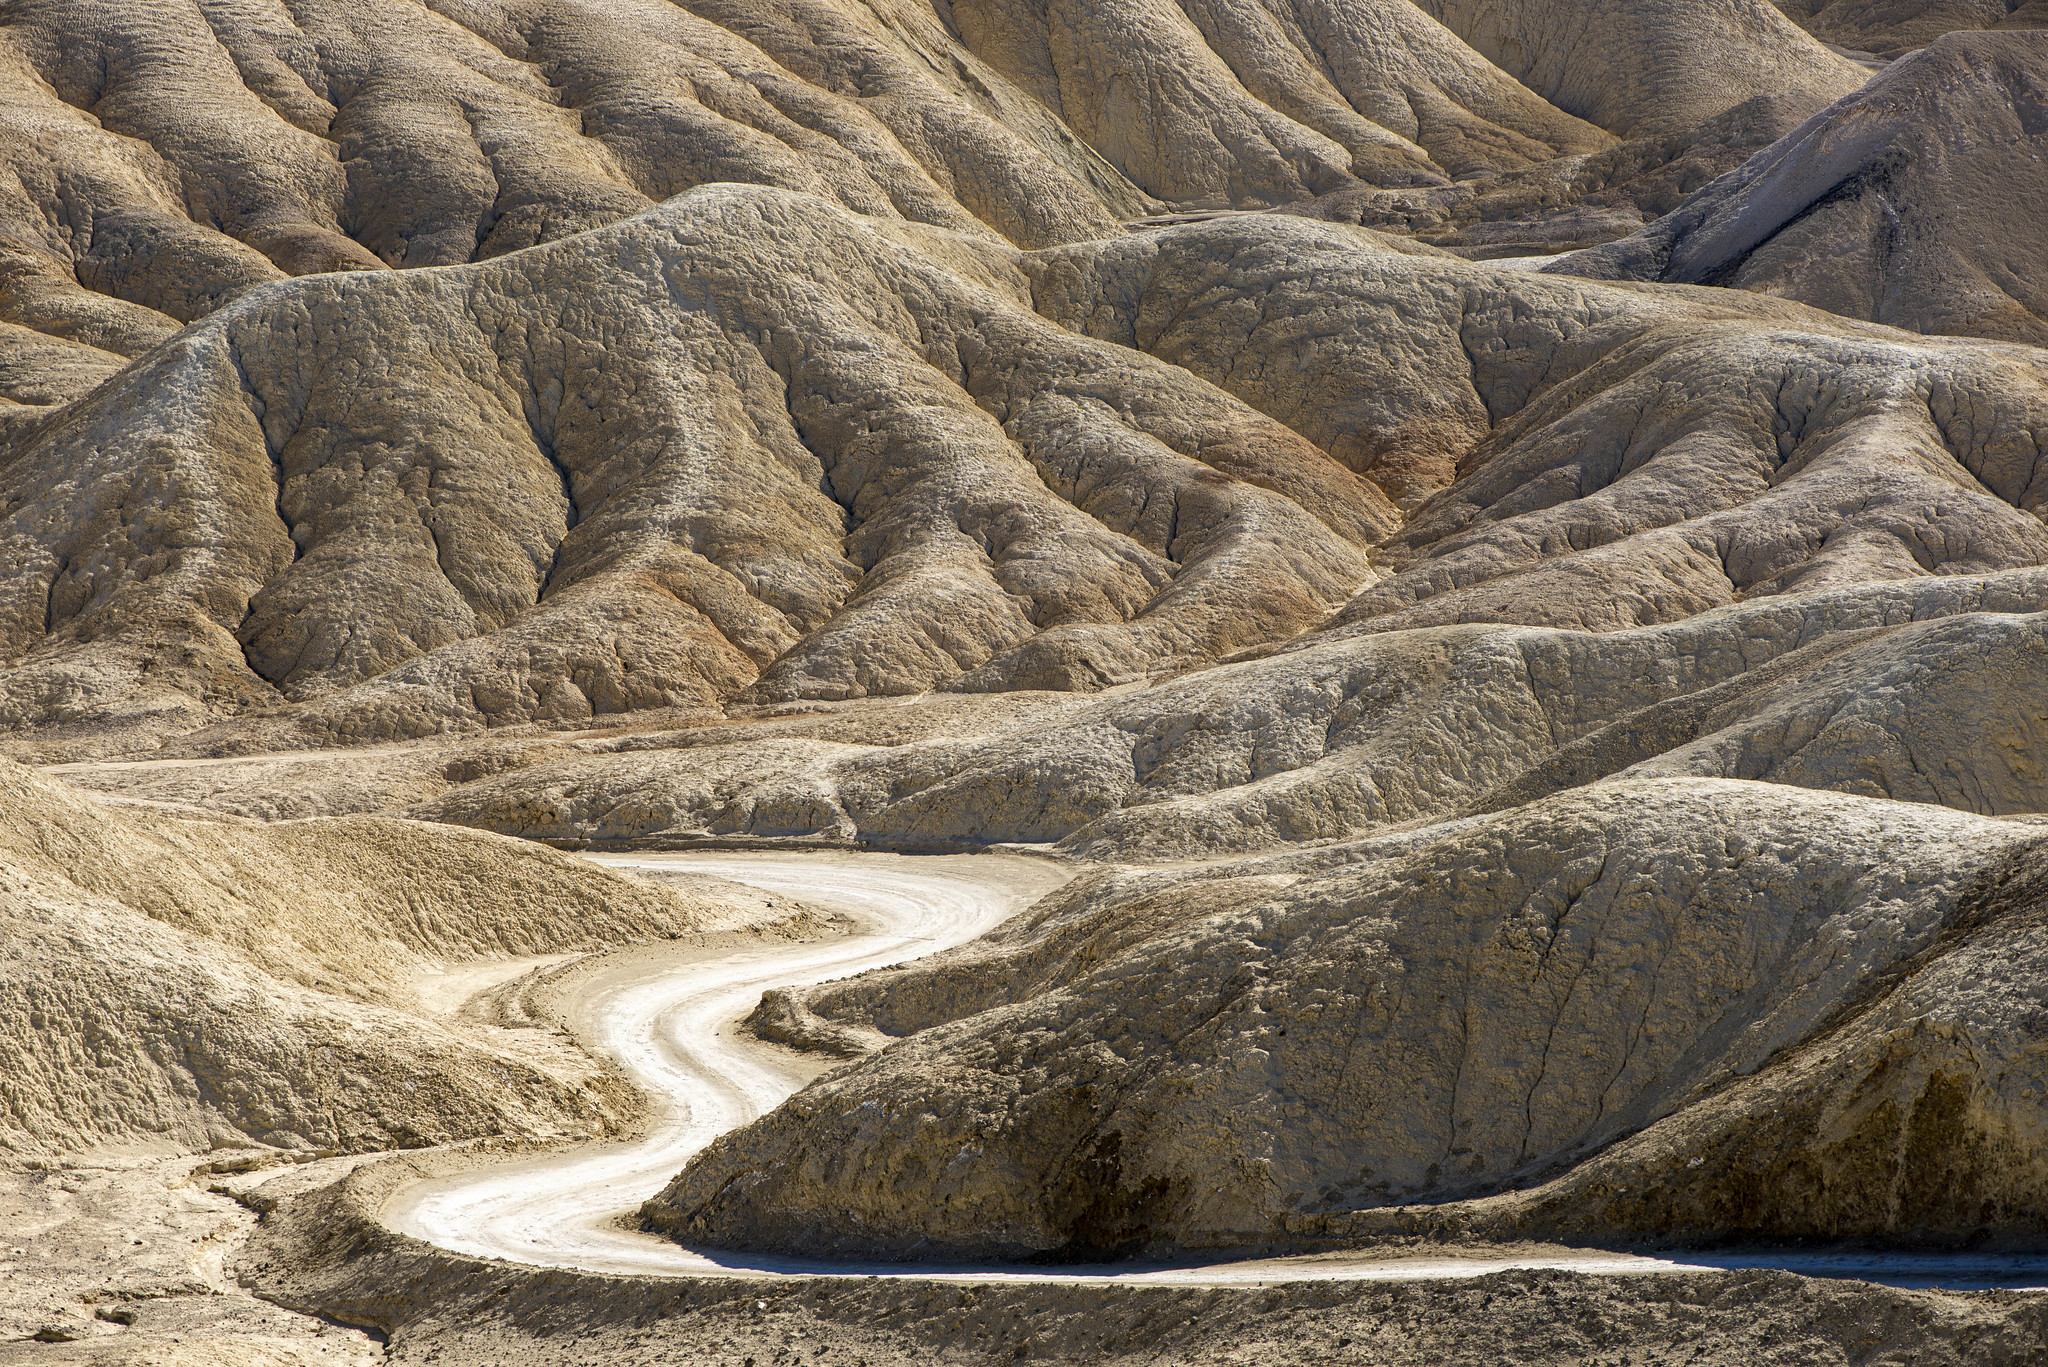 Death Valley - 20 Horse Team Canyon 4